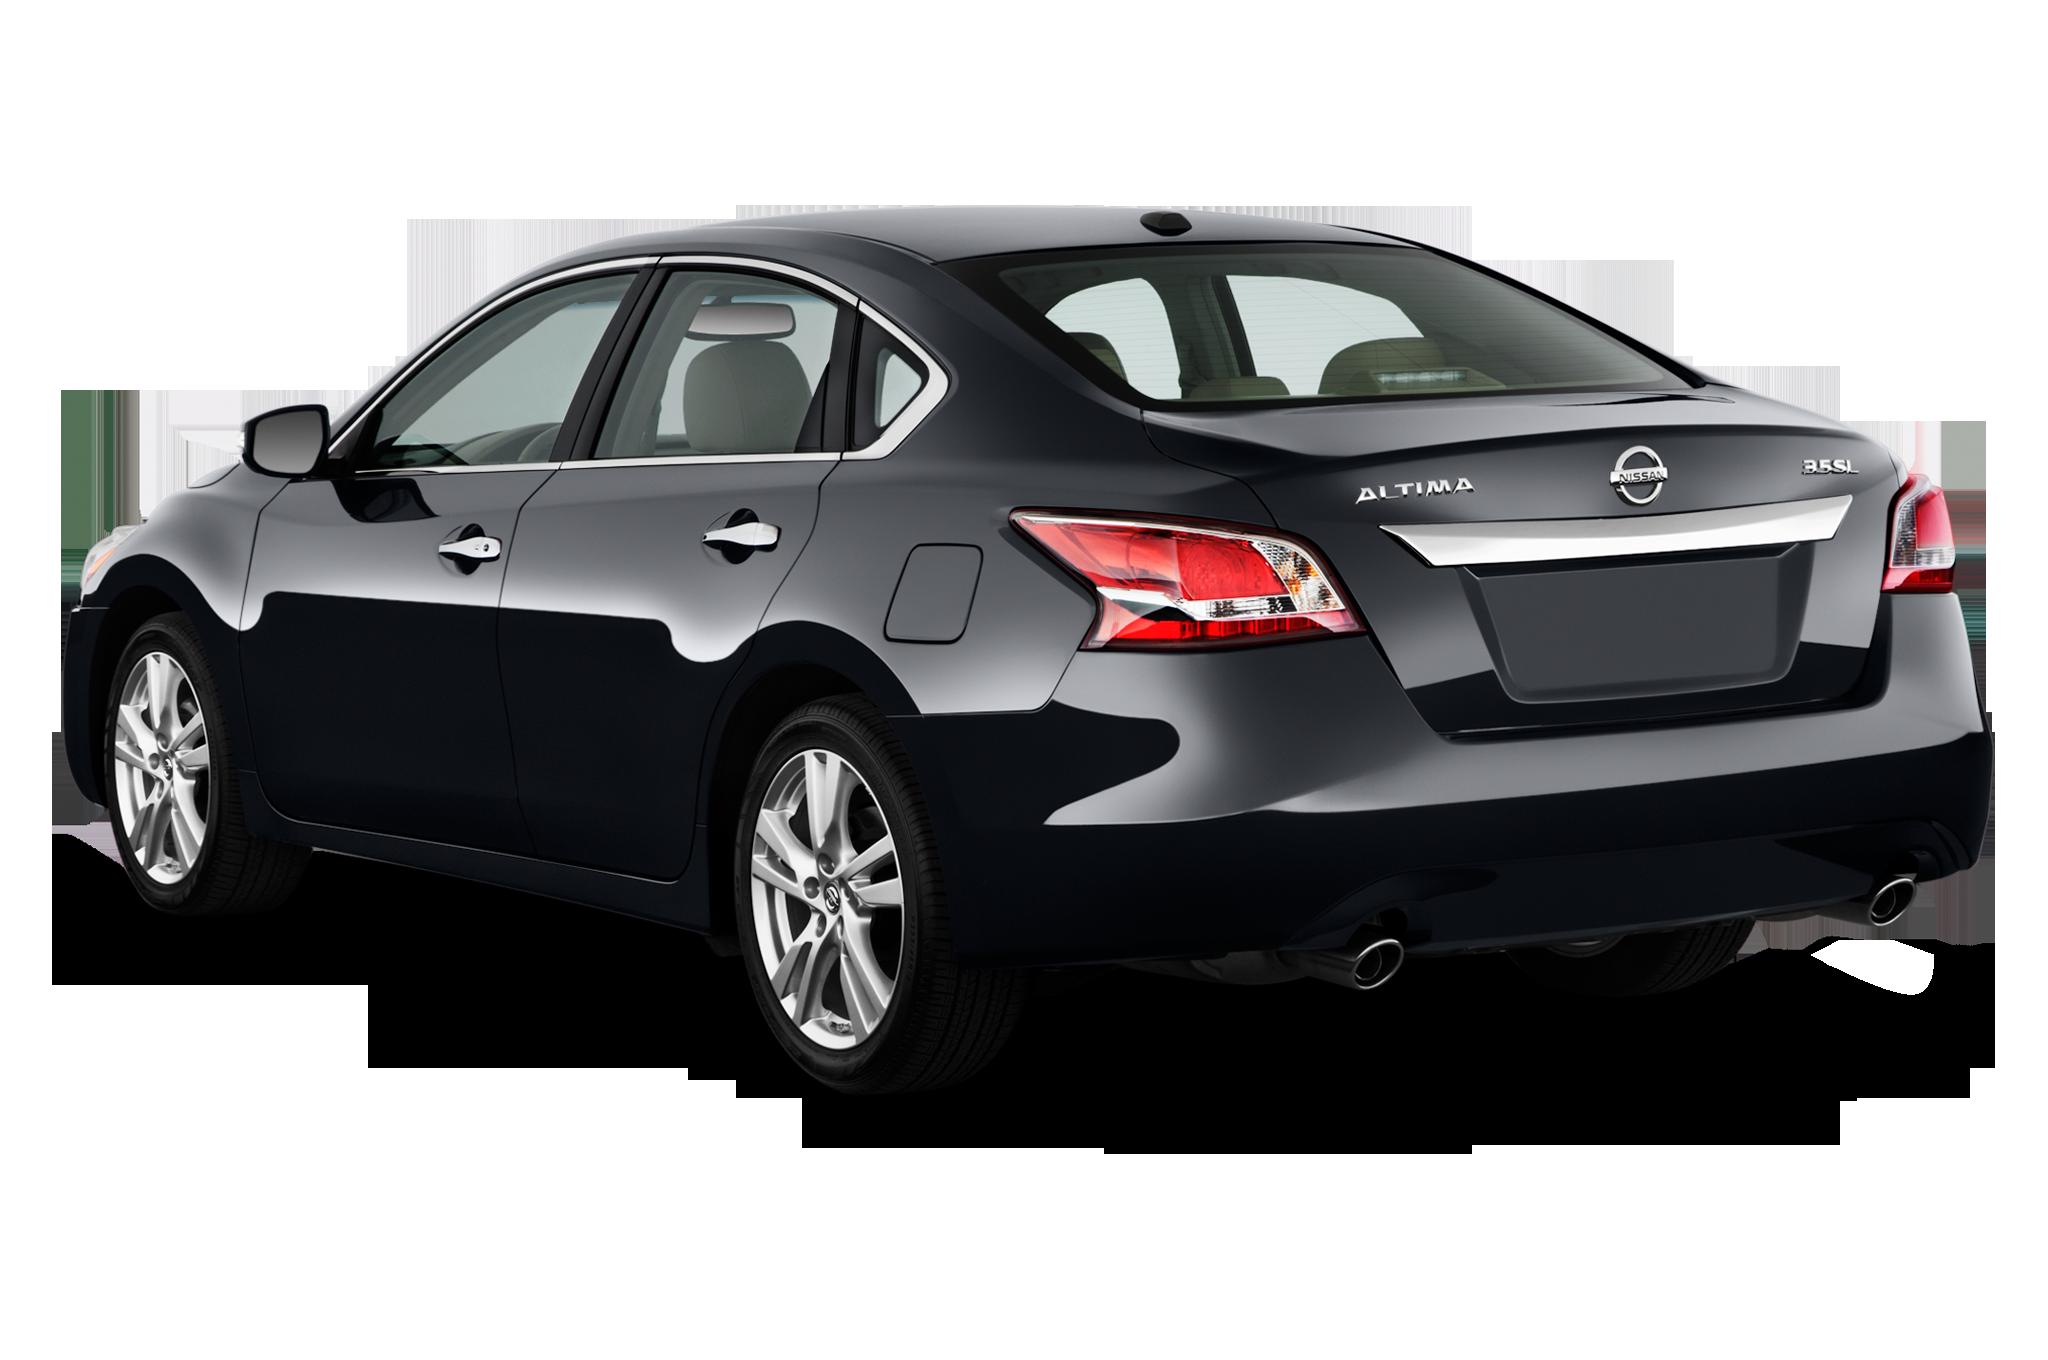 2014 Nissan Altima 2 5 Sl Around The Block Automobile